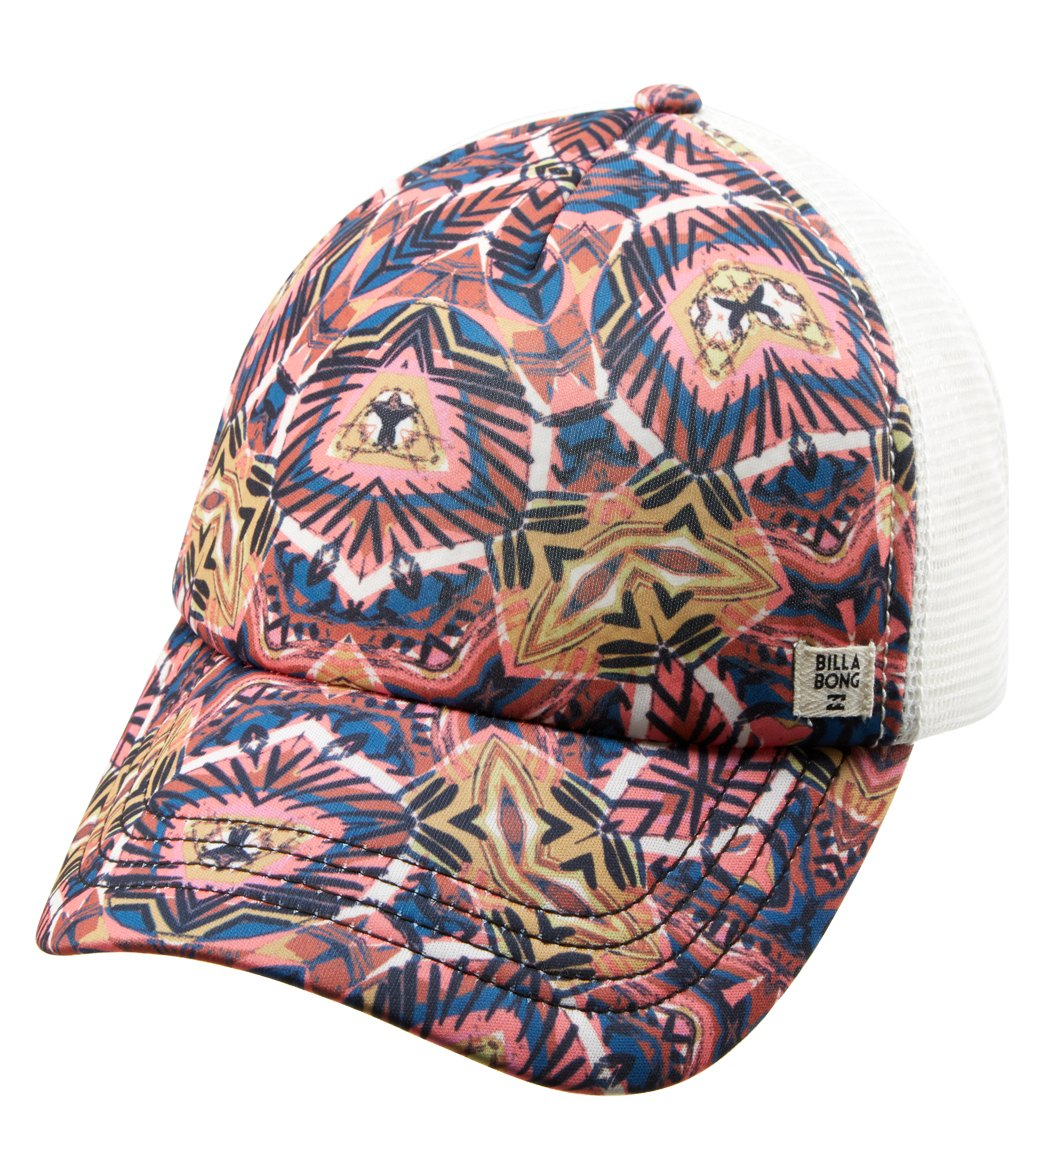 3e6a5f4ac8622 Billabong Heritage Mashup Trucker Hat at SwimOutlet.com